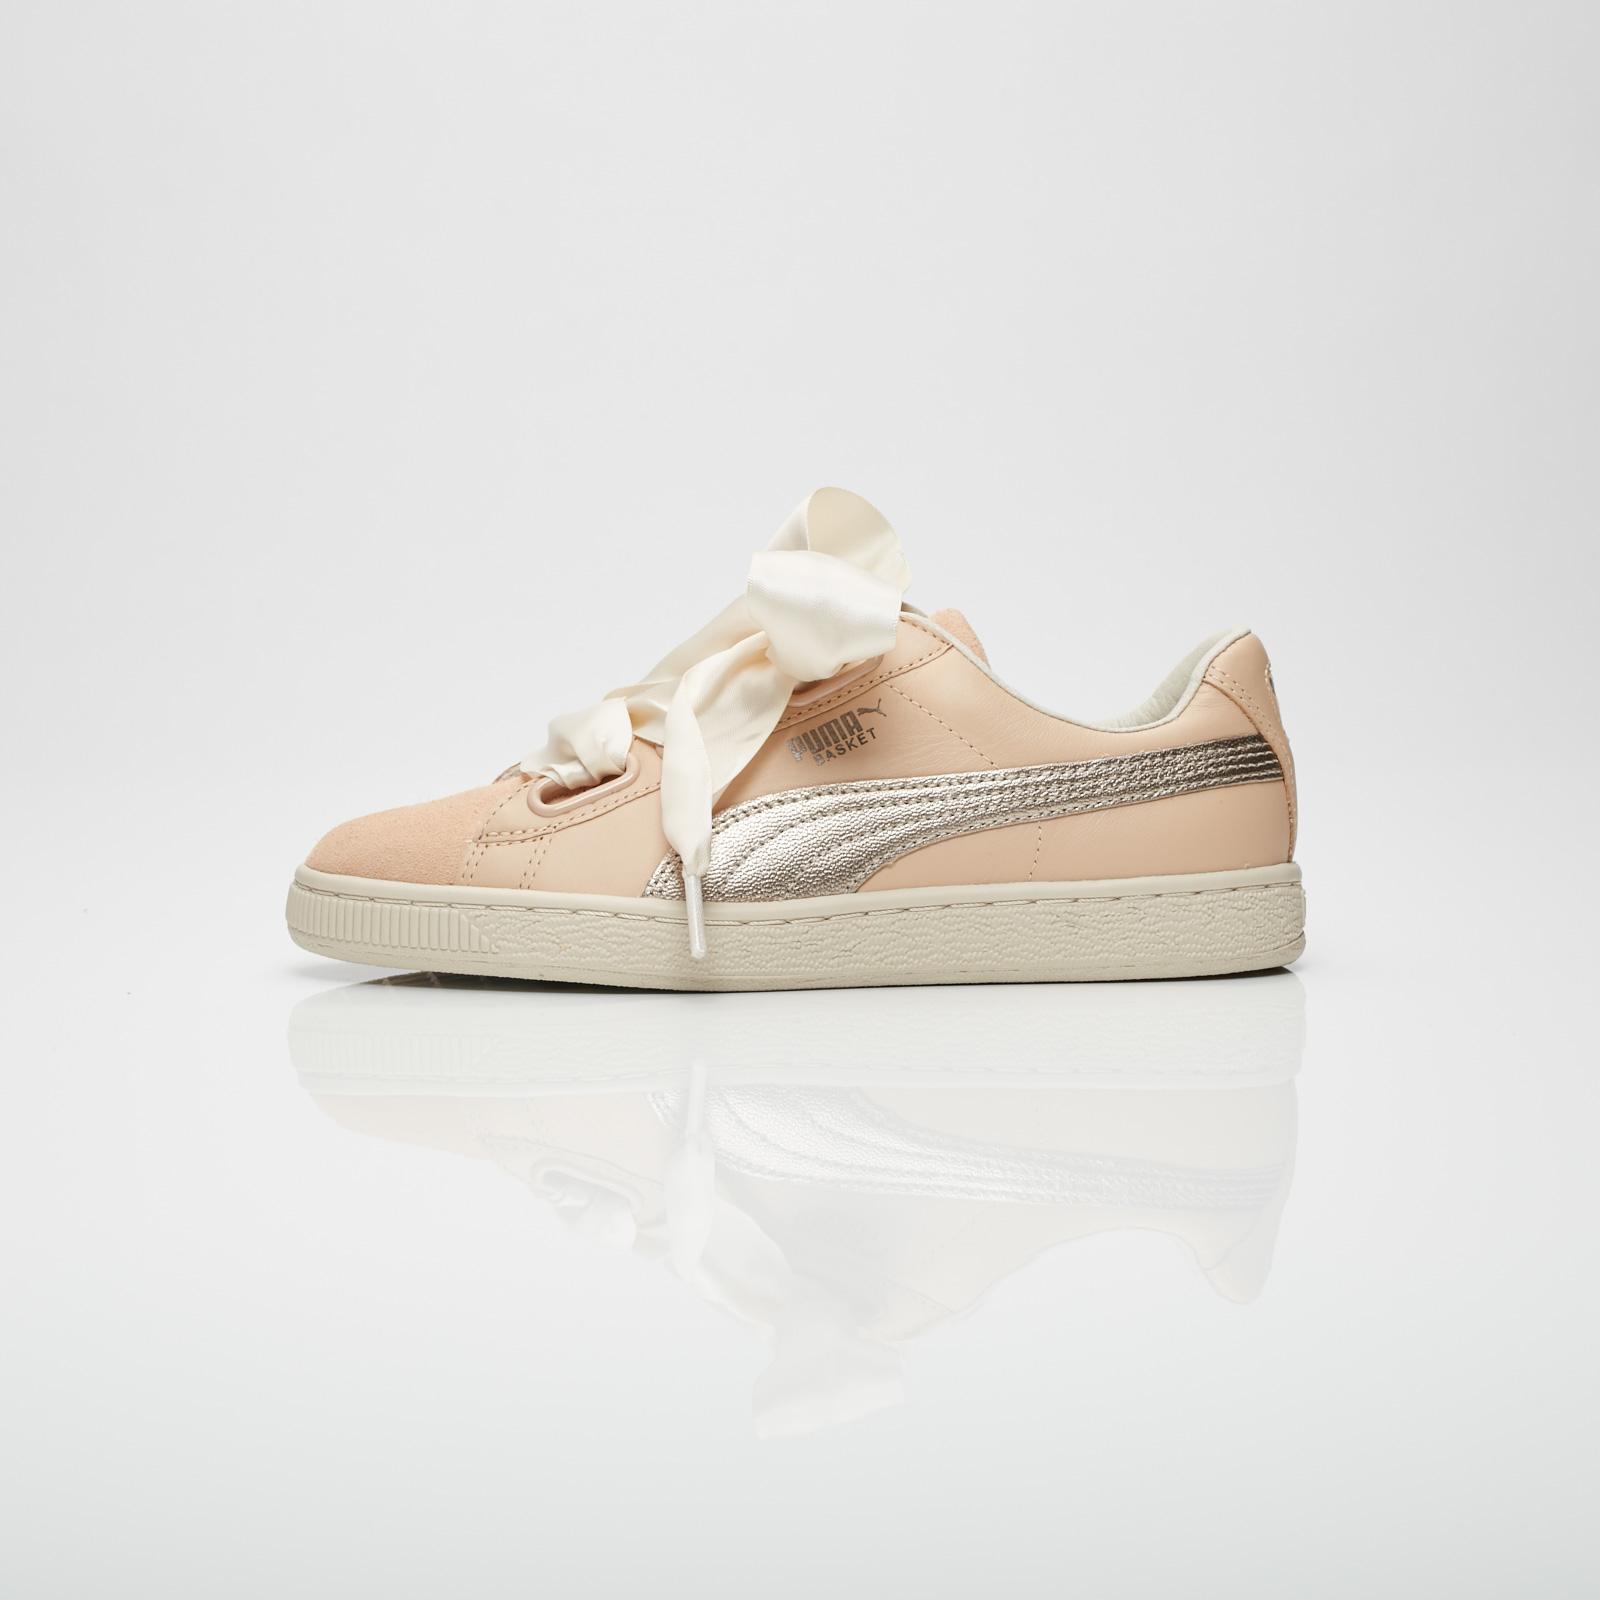 sports shoes 05cdb dc632 Puma Basket Heart Up Wns - 364955-01 - Sneakersnstuff ...